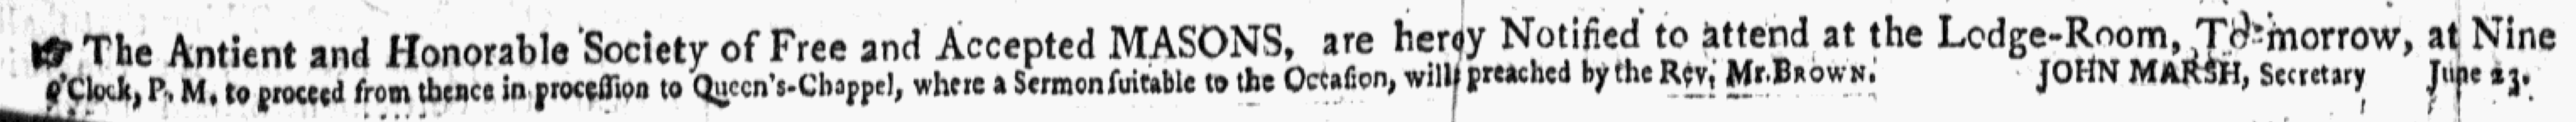 Jun 23 - 6:23:1769 Page 1 New-Hampshire Gazette